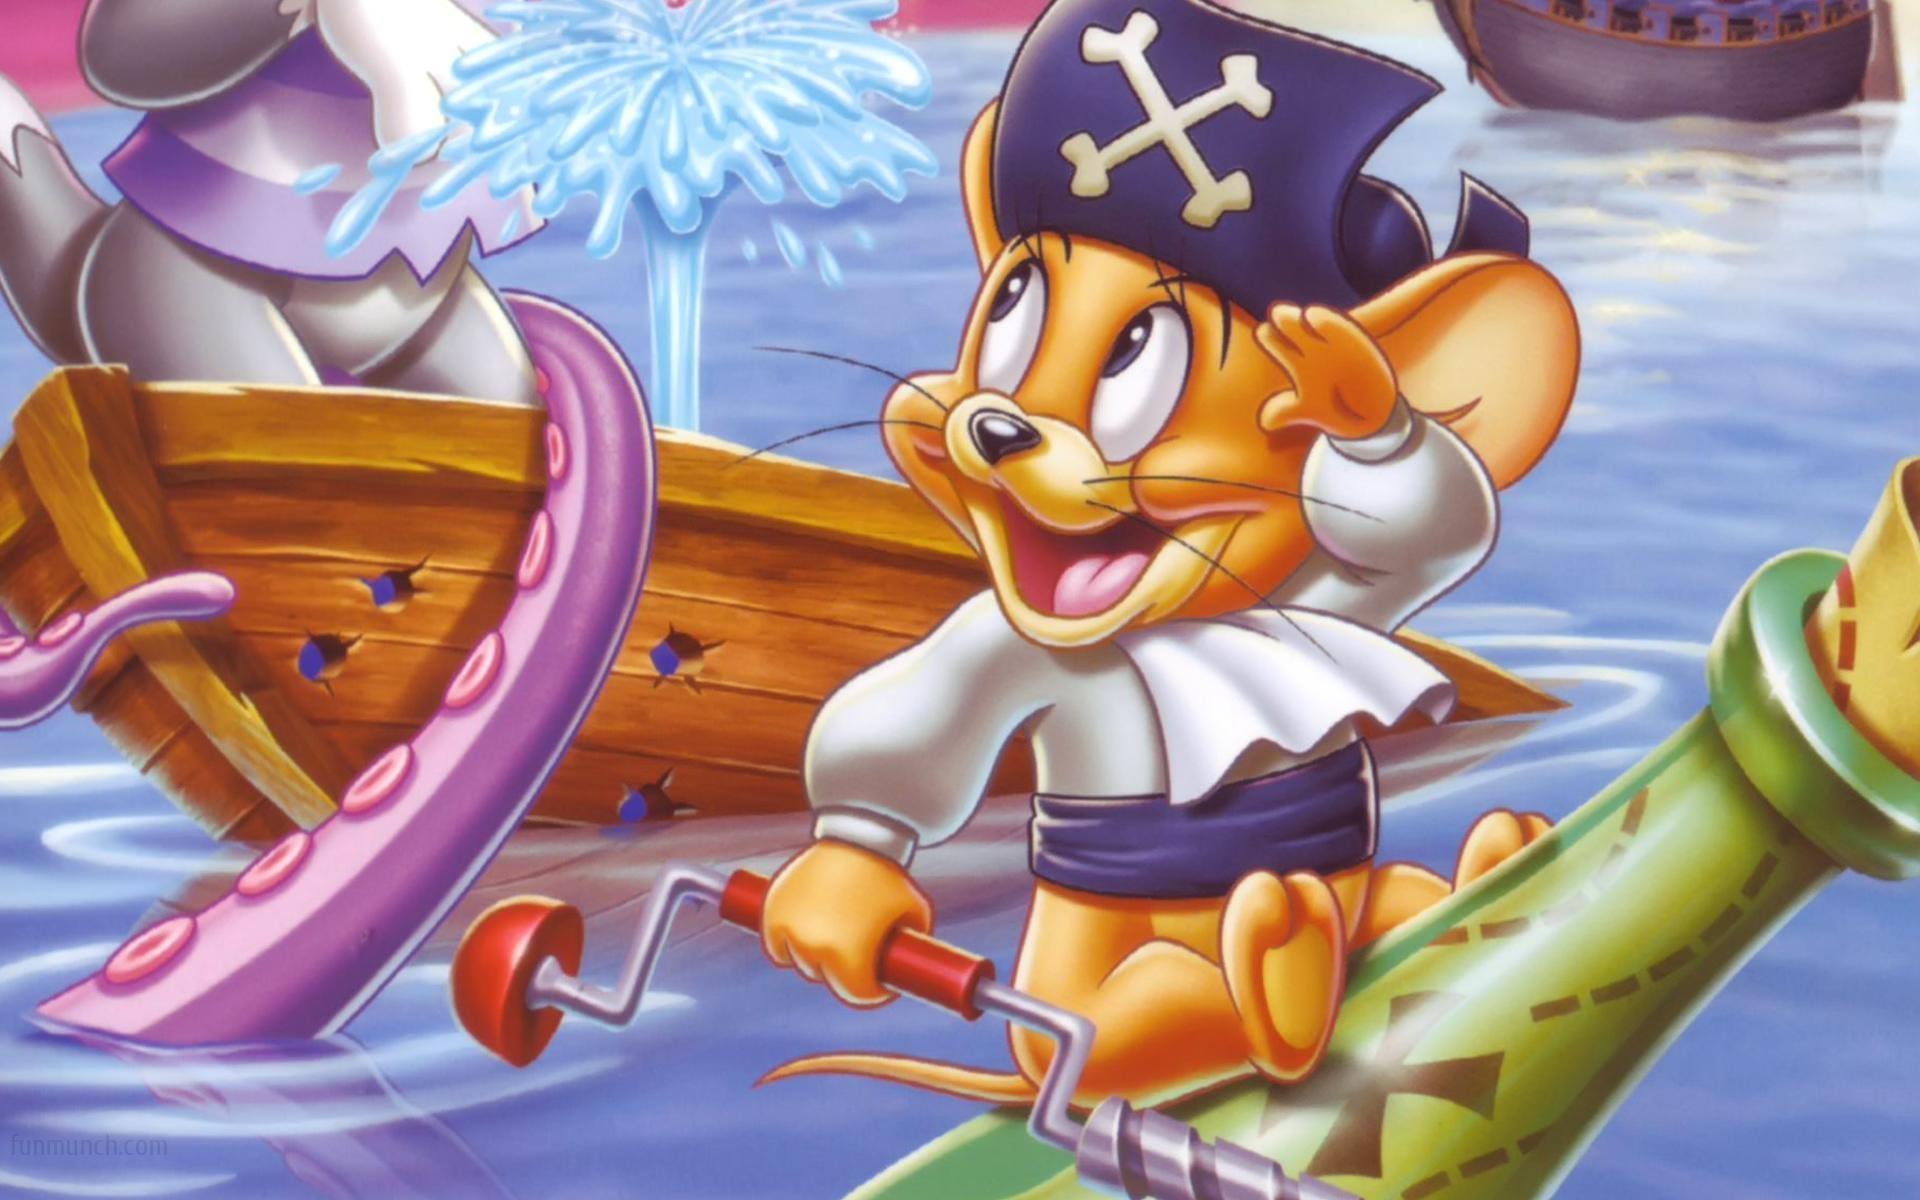 Popeye Wallpaper 3d Cartoon Of Tom And Jerry Hd Wallpaper